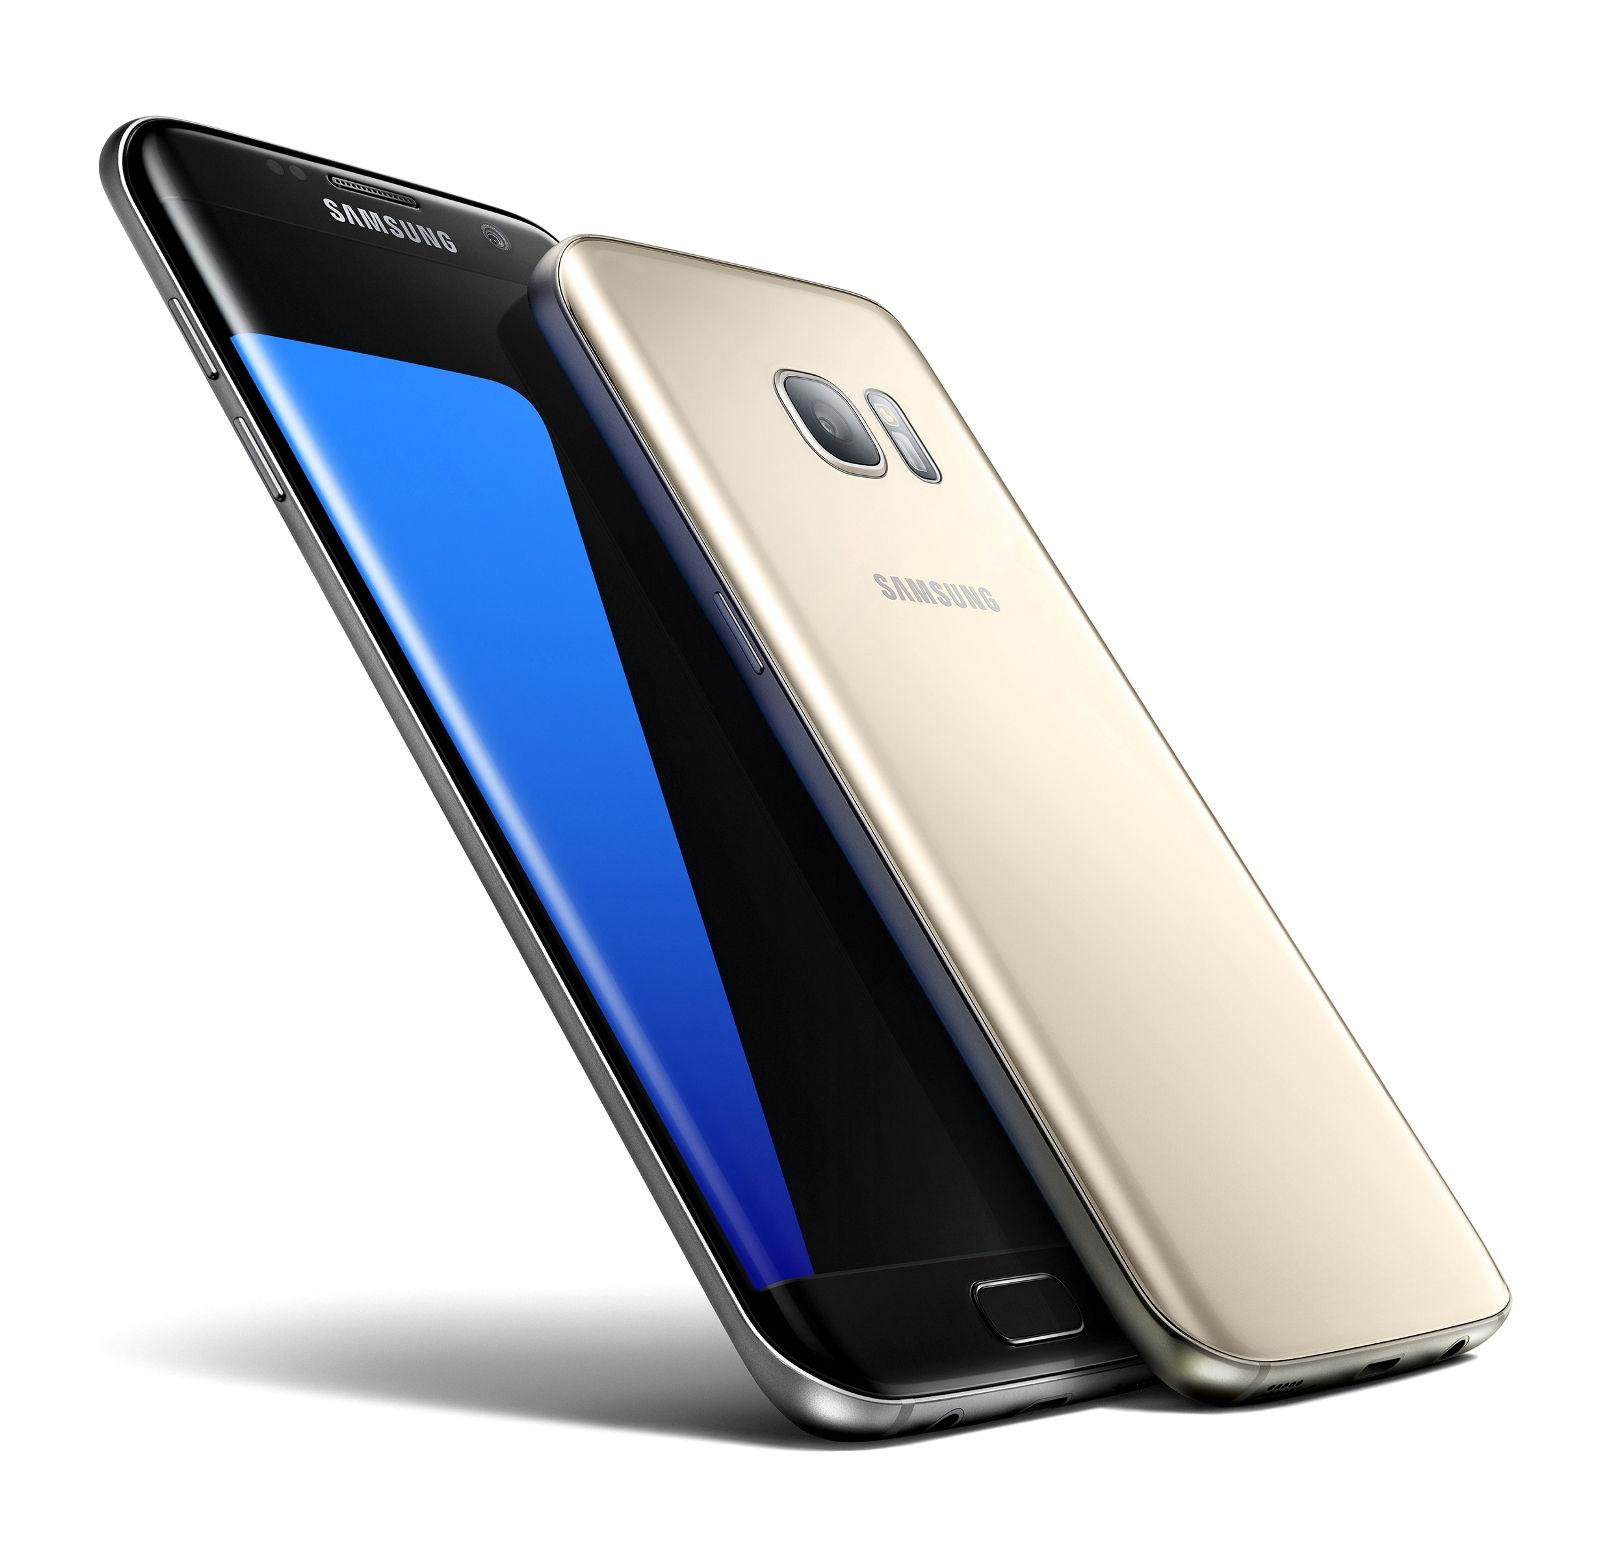 https://www.telefonguru.hu/images/content/Samsung_Galaxy_S7_S7edge.jpg